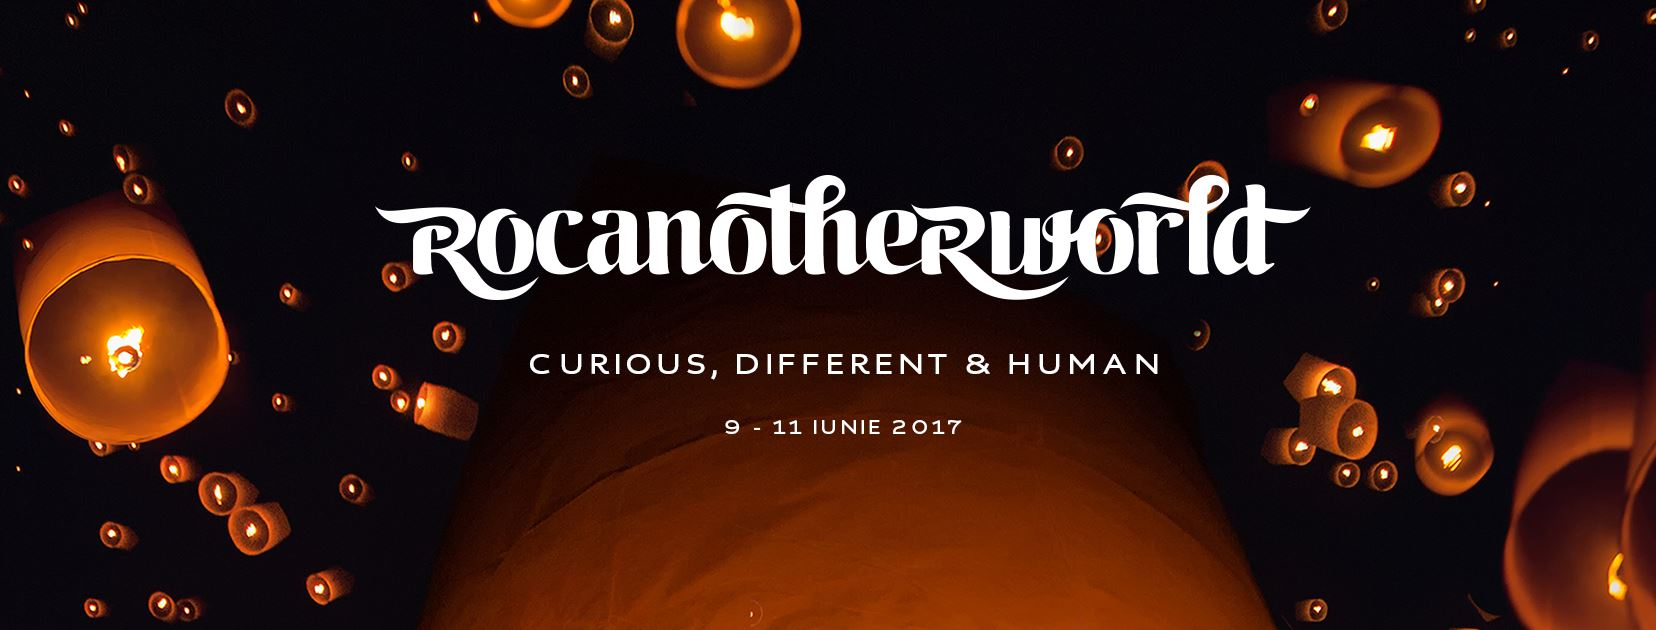 Rocanotherworld 2017